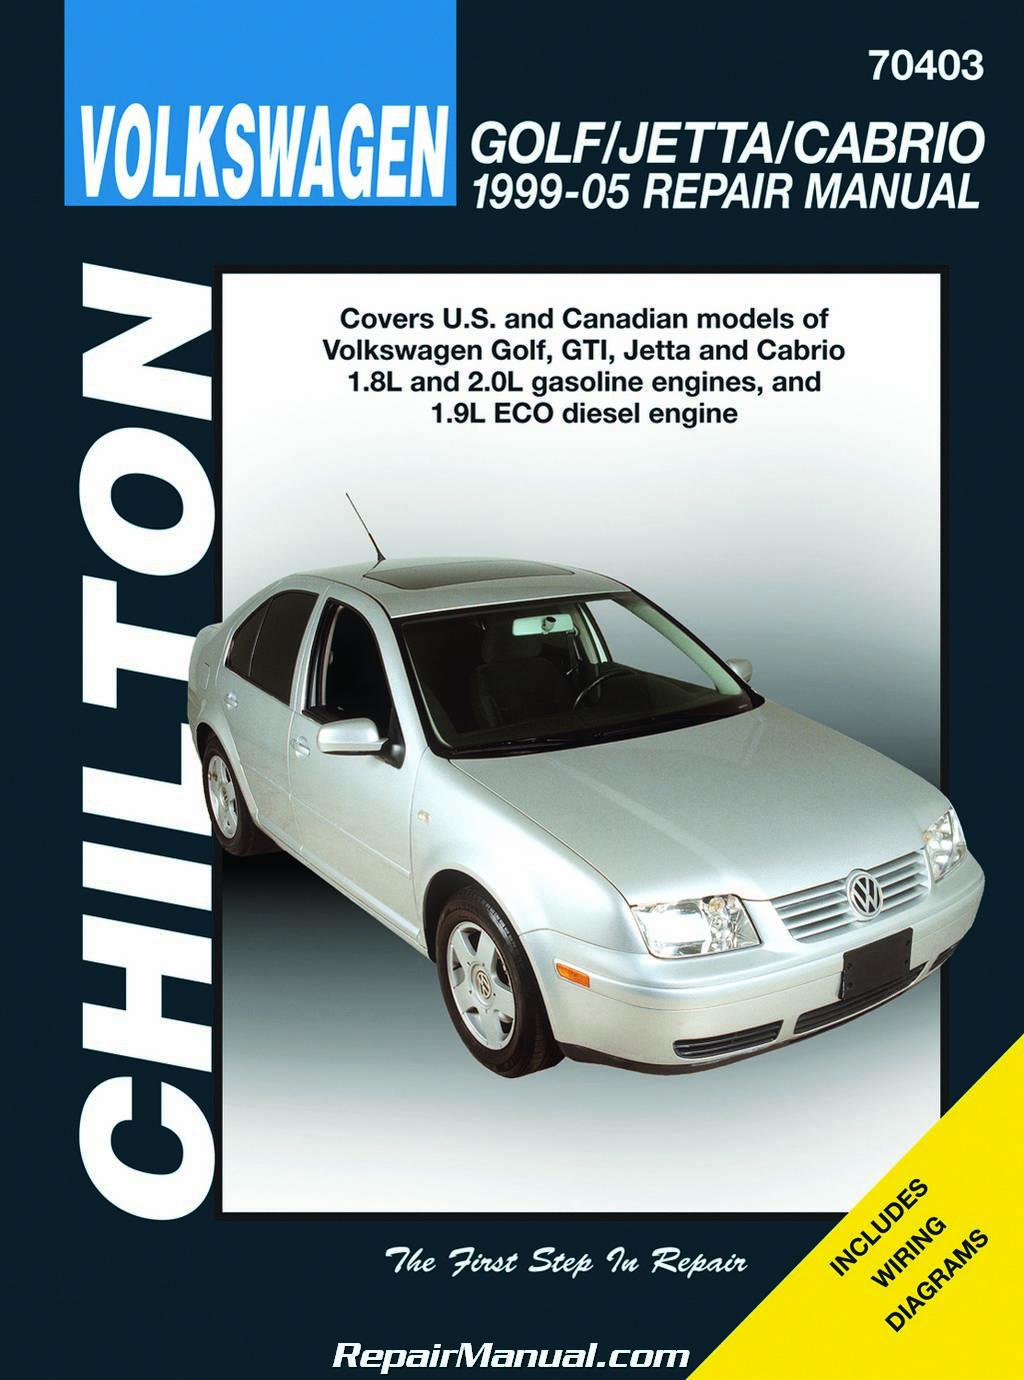 chilton volkswagen golf jetta and gti 1999 2005 repair. Black Bedroom Furniture Sets. Home Design Ideas